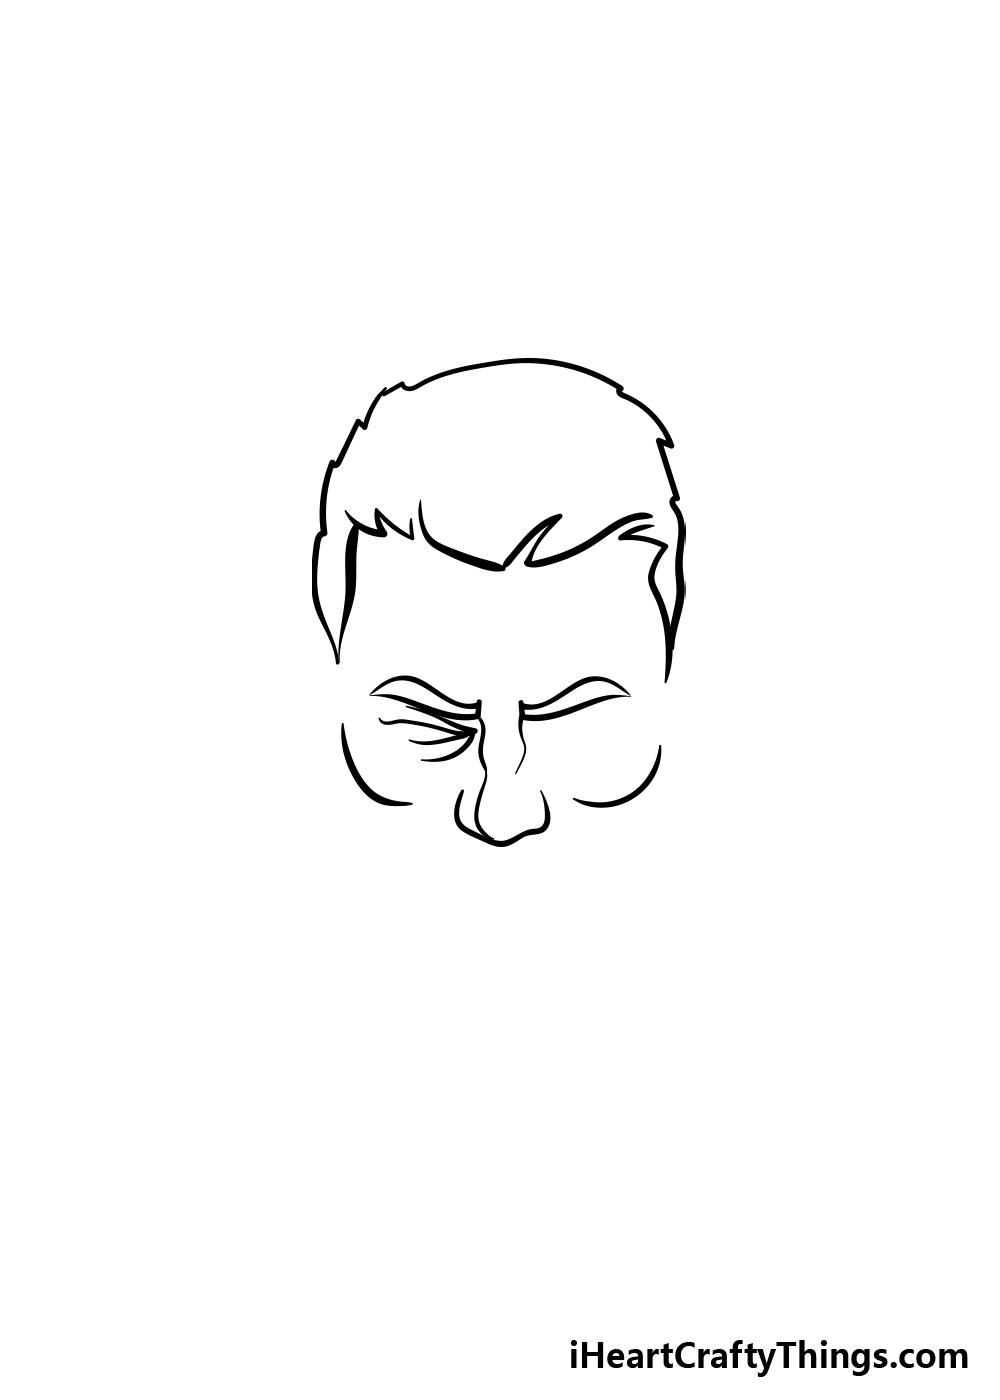 drawing a beard step 1